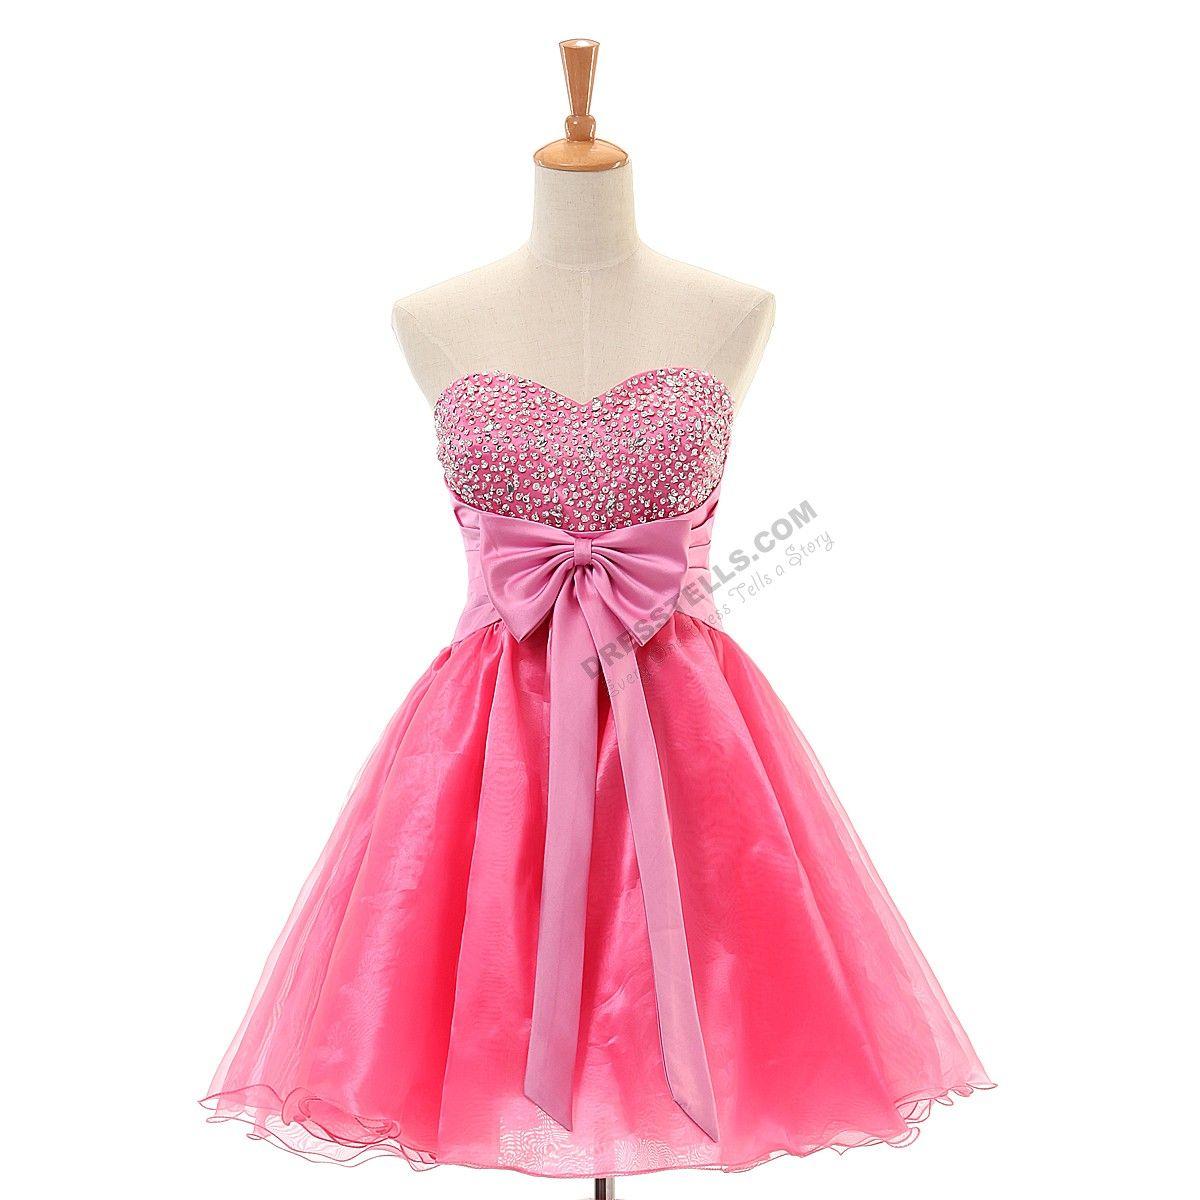 708d8c91ed17 cocktail dress,homecoming dress Cheap Evening Dresses, Online Dress Shopping,  Homecoming Dresses,